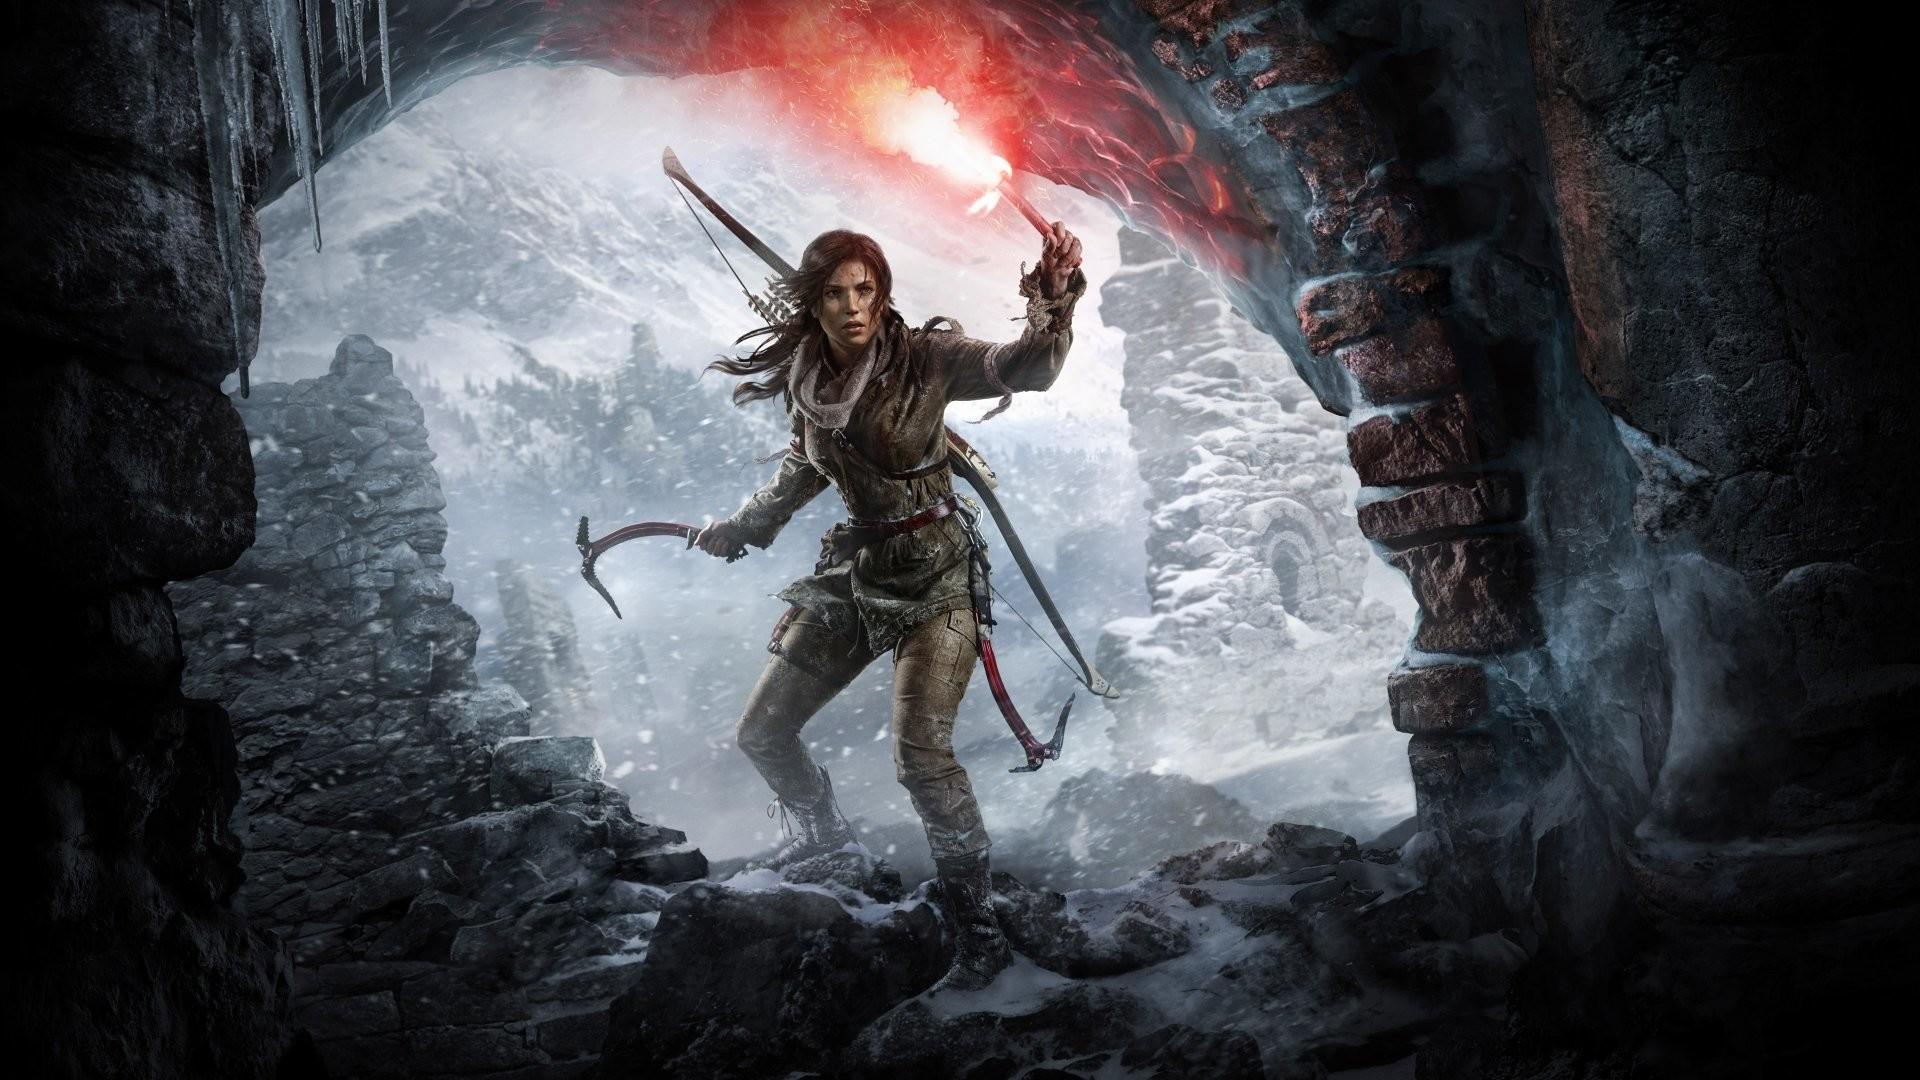 Lara Croft Wallpaper Hd 79 Images